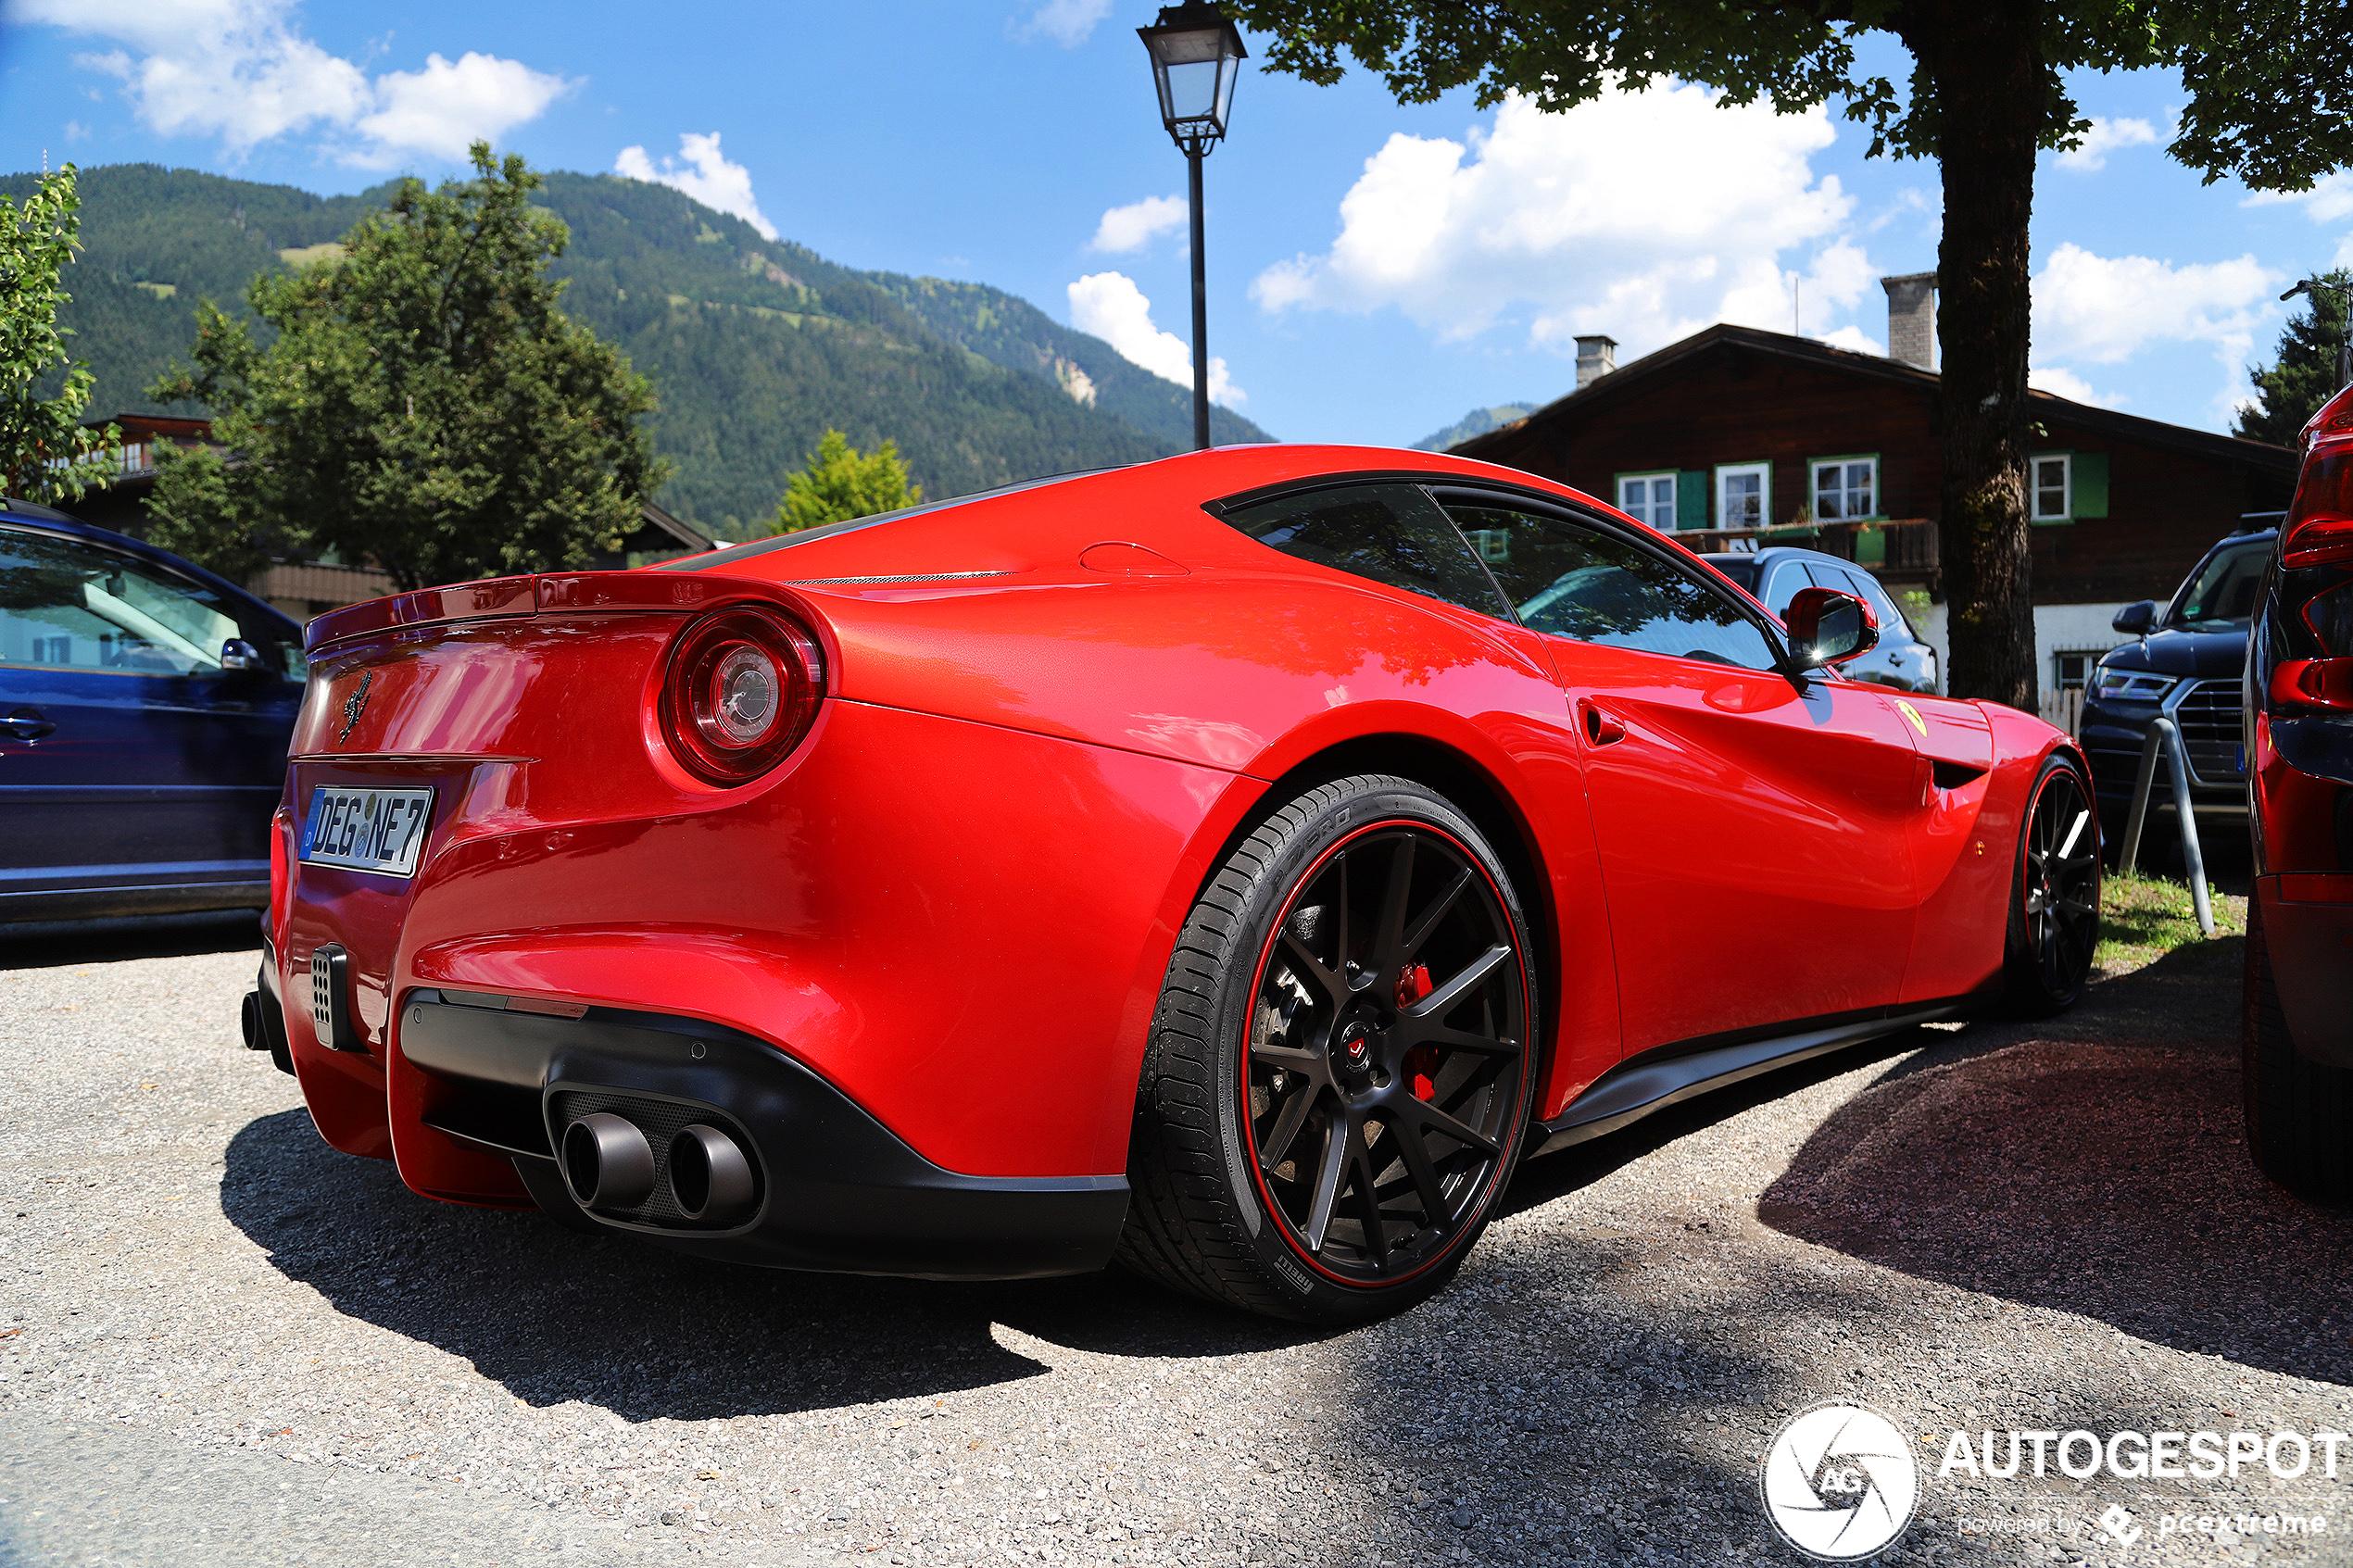 Beeldschone Ferrari F12berlinetta schittert in Kitzbühel